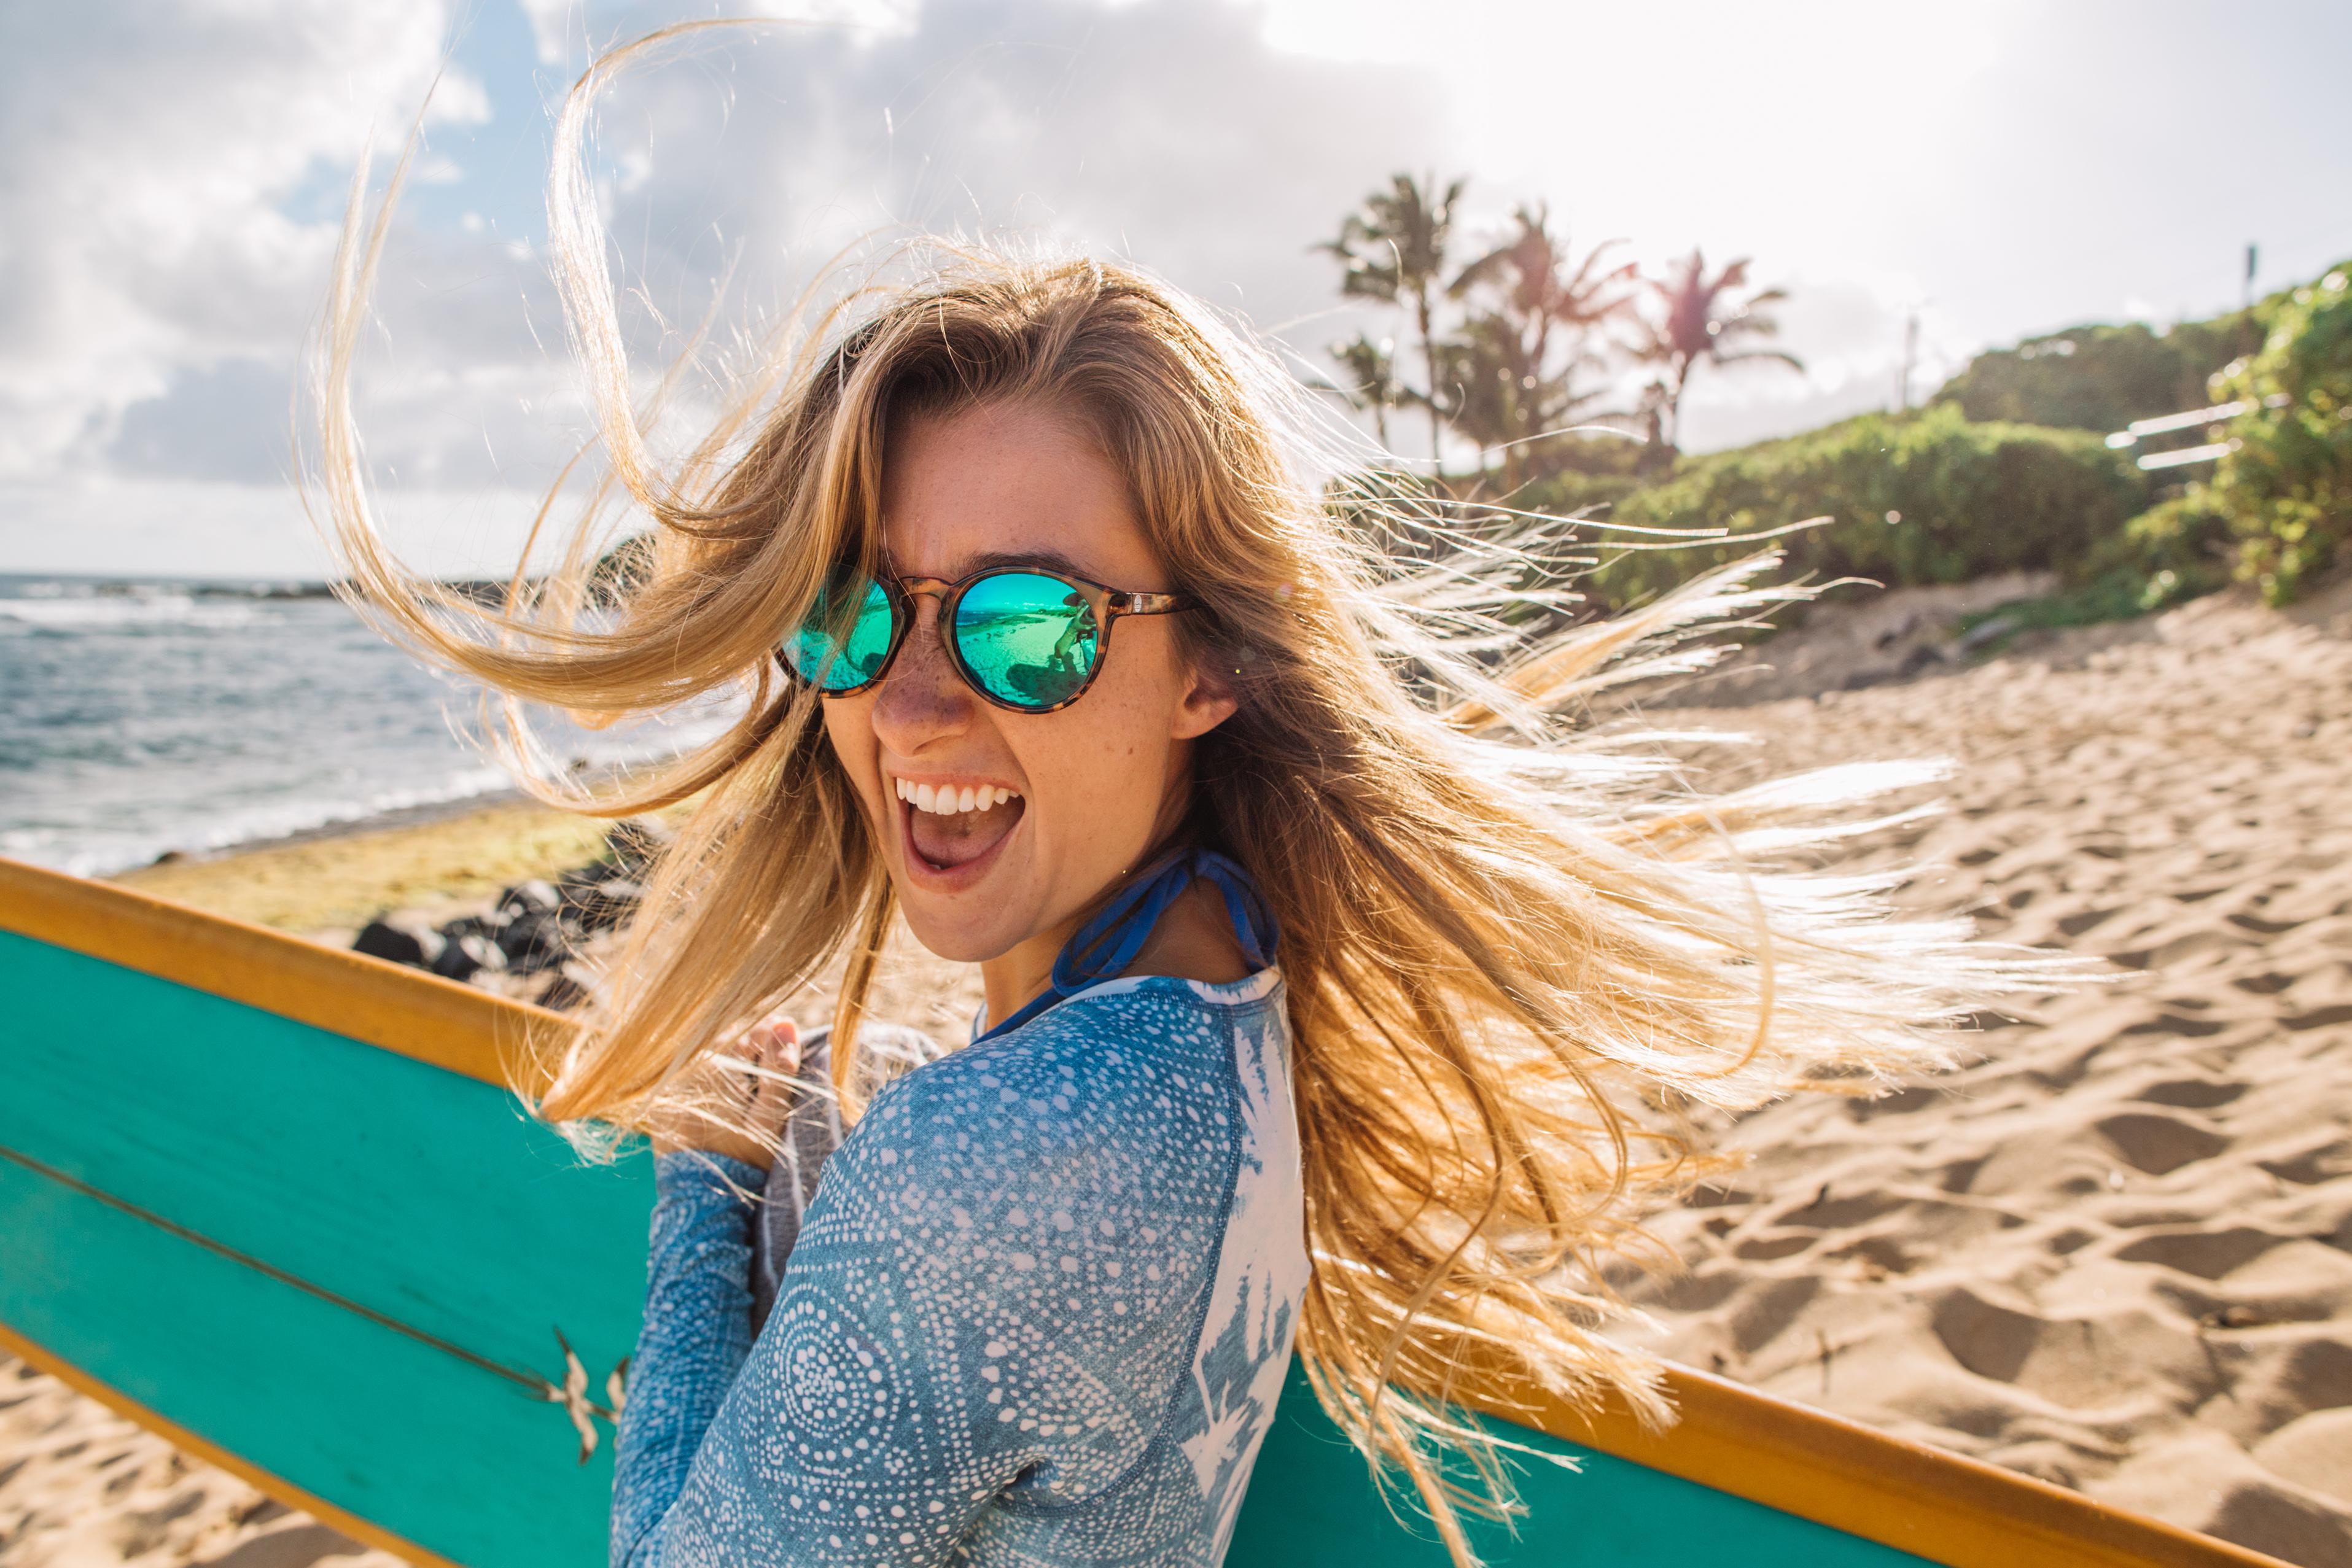 Best Sunglasses For Summer Activities | sunglasses | summer | activities | summer activities | sunglasses for summer activities | sunglasses for summer